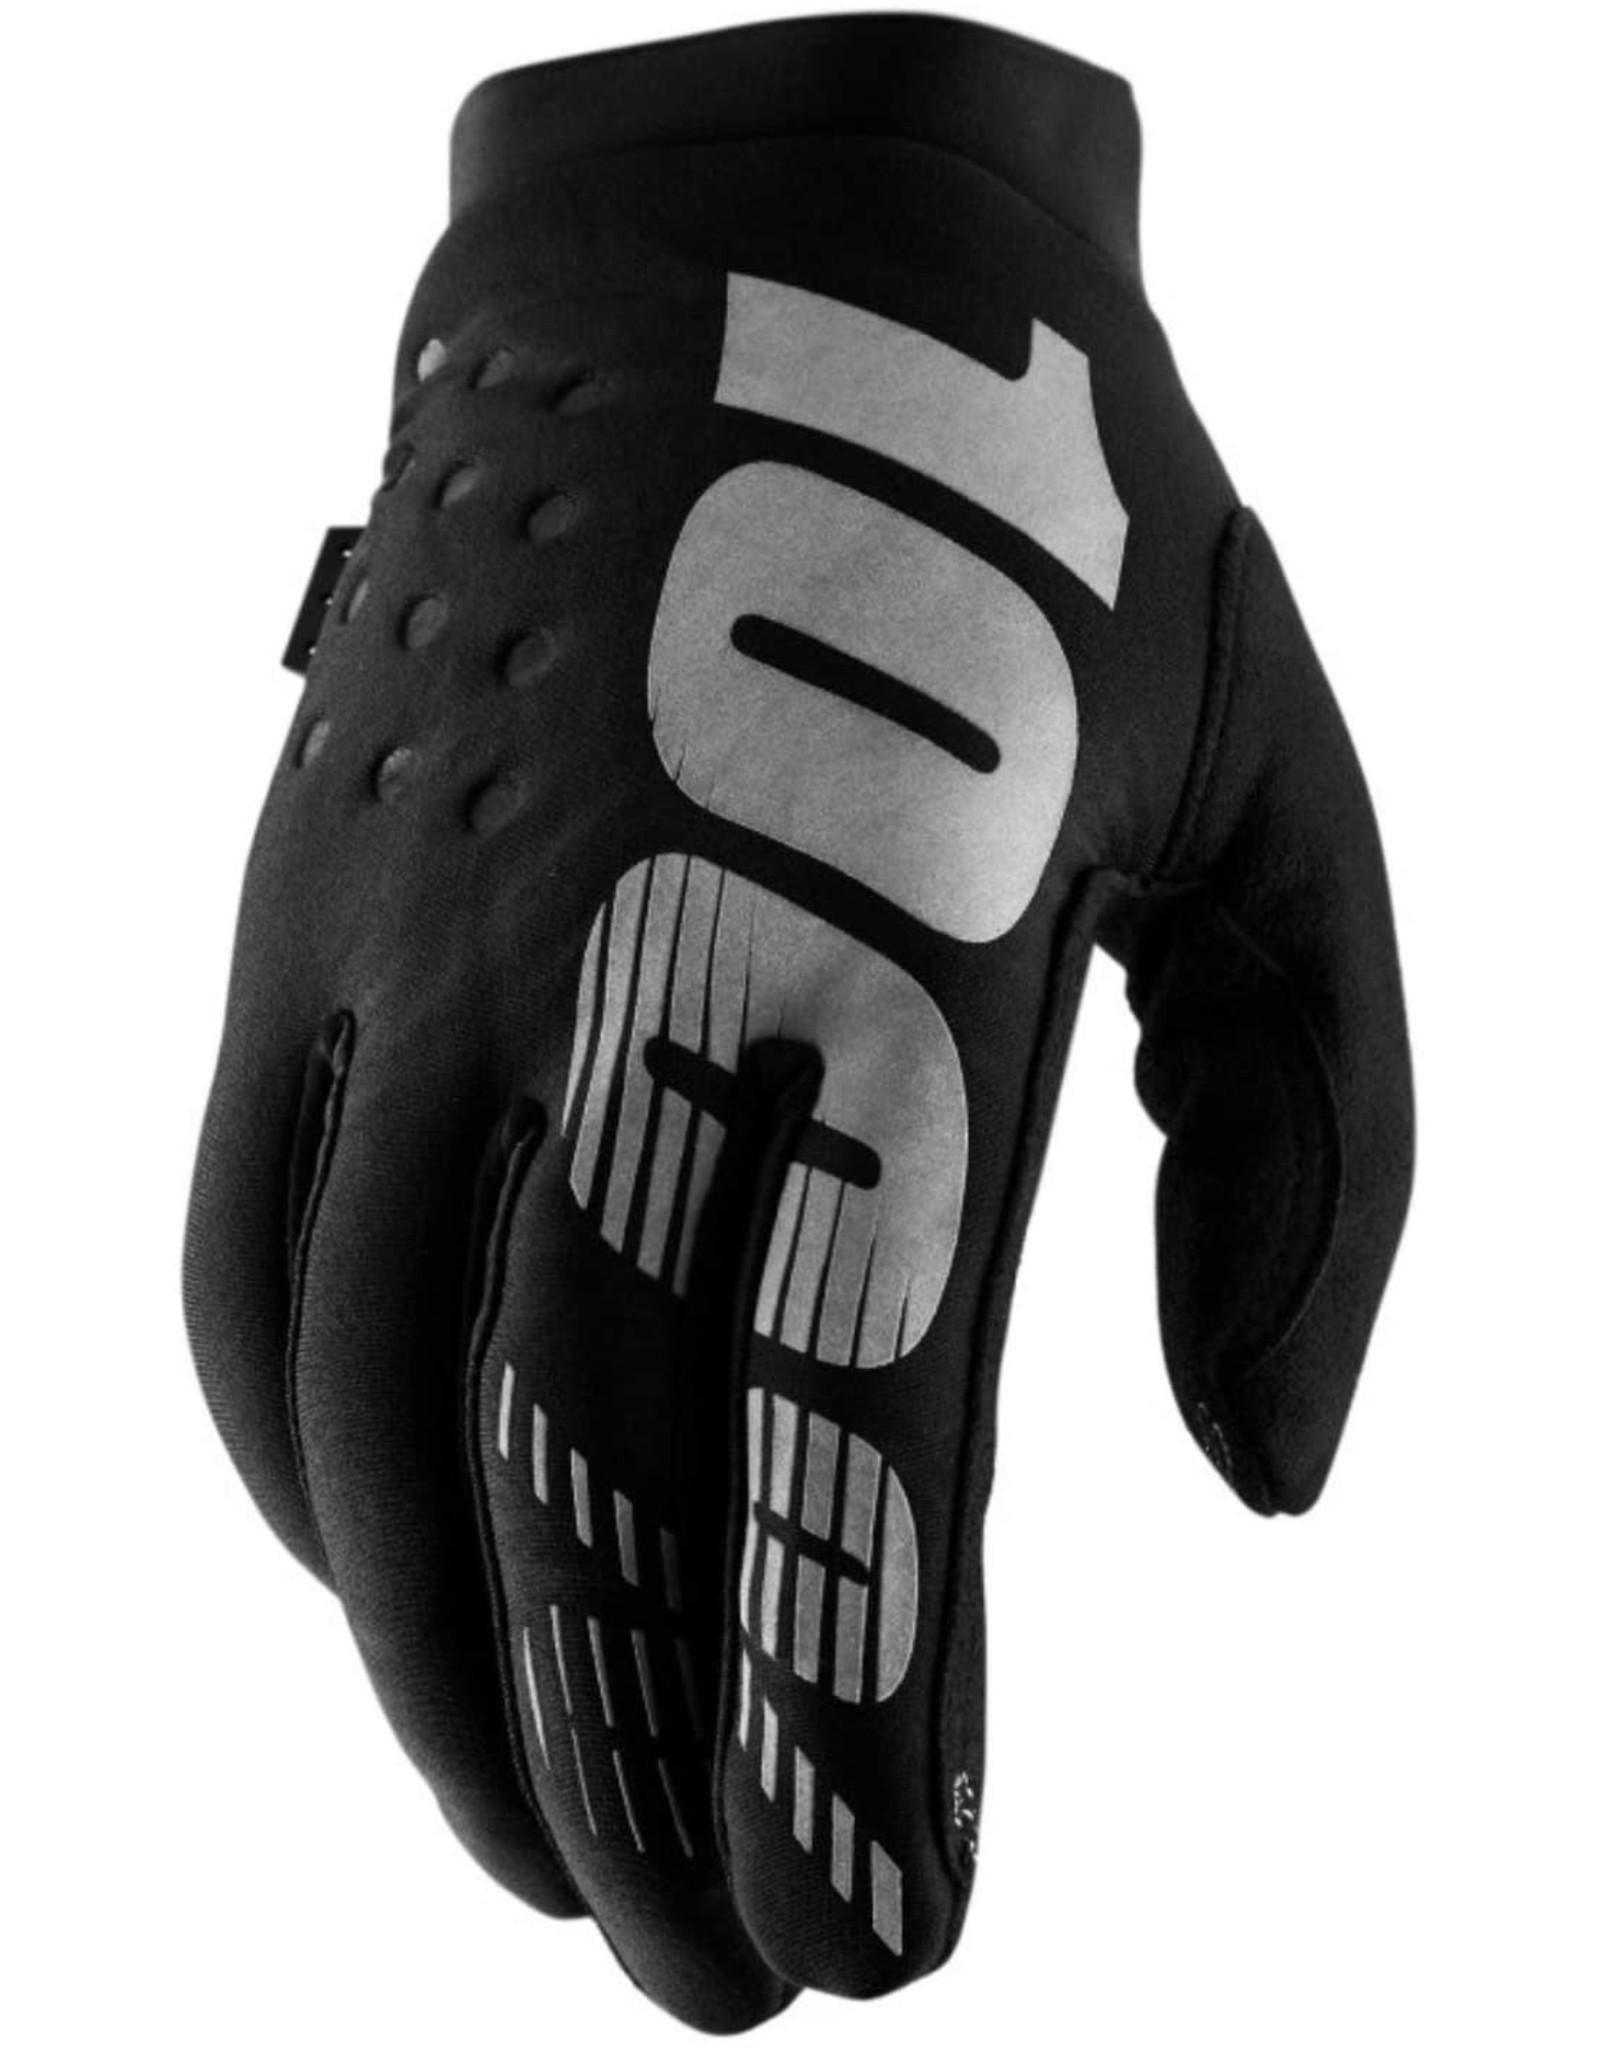 100% 100% - BRISKER  Glove Black/Grey S